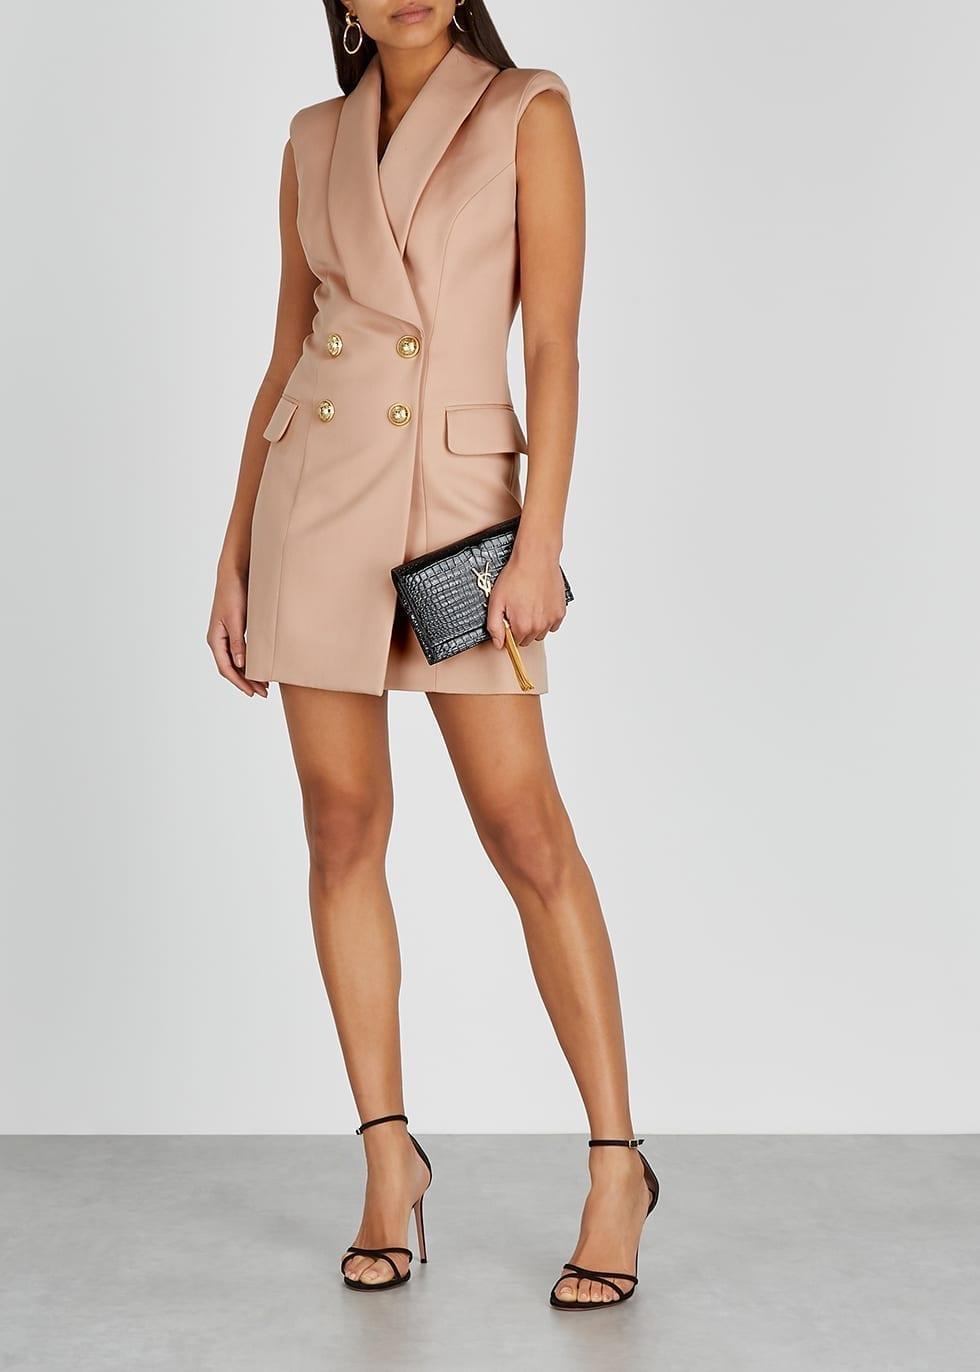 BALMAIN Blush Wool Blazer Dress